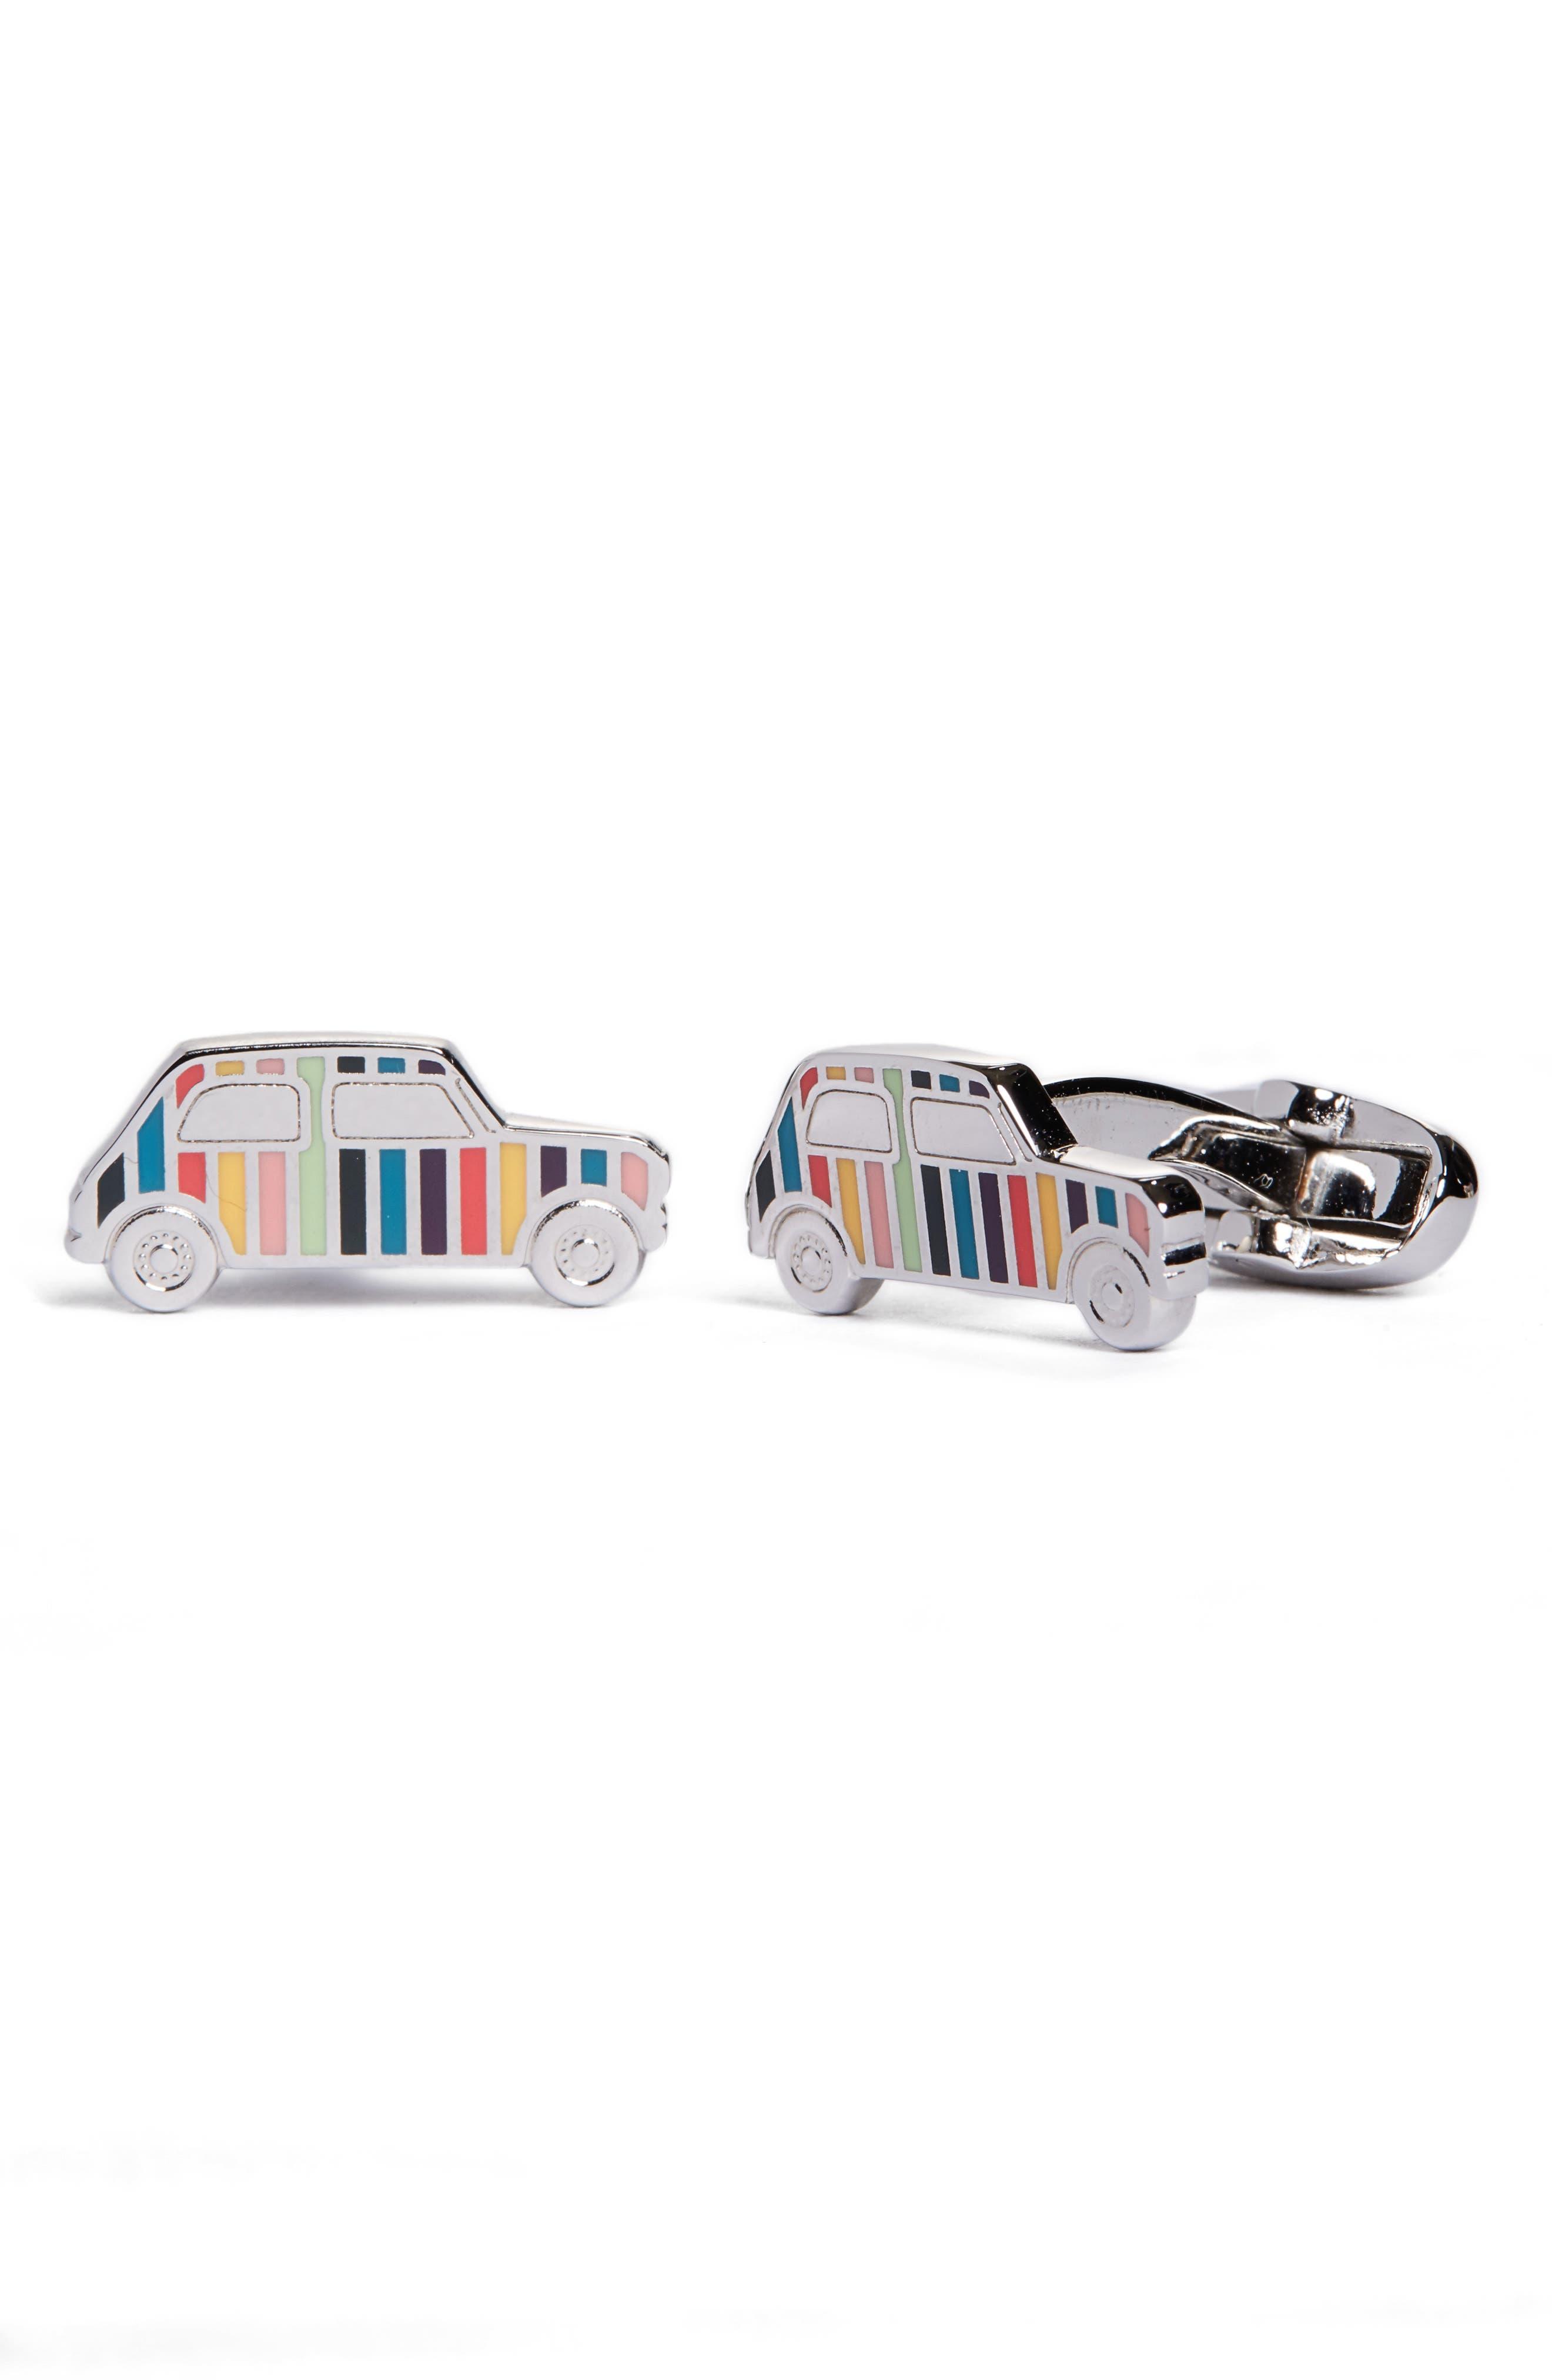 Enamel Stripe Car Cuff Links,                             Alternate thumbnail 2, color,                             METALLIC SILVER